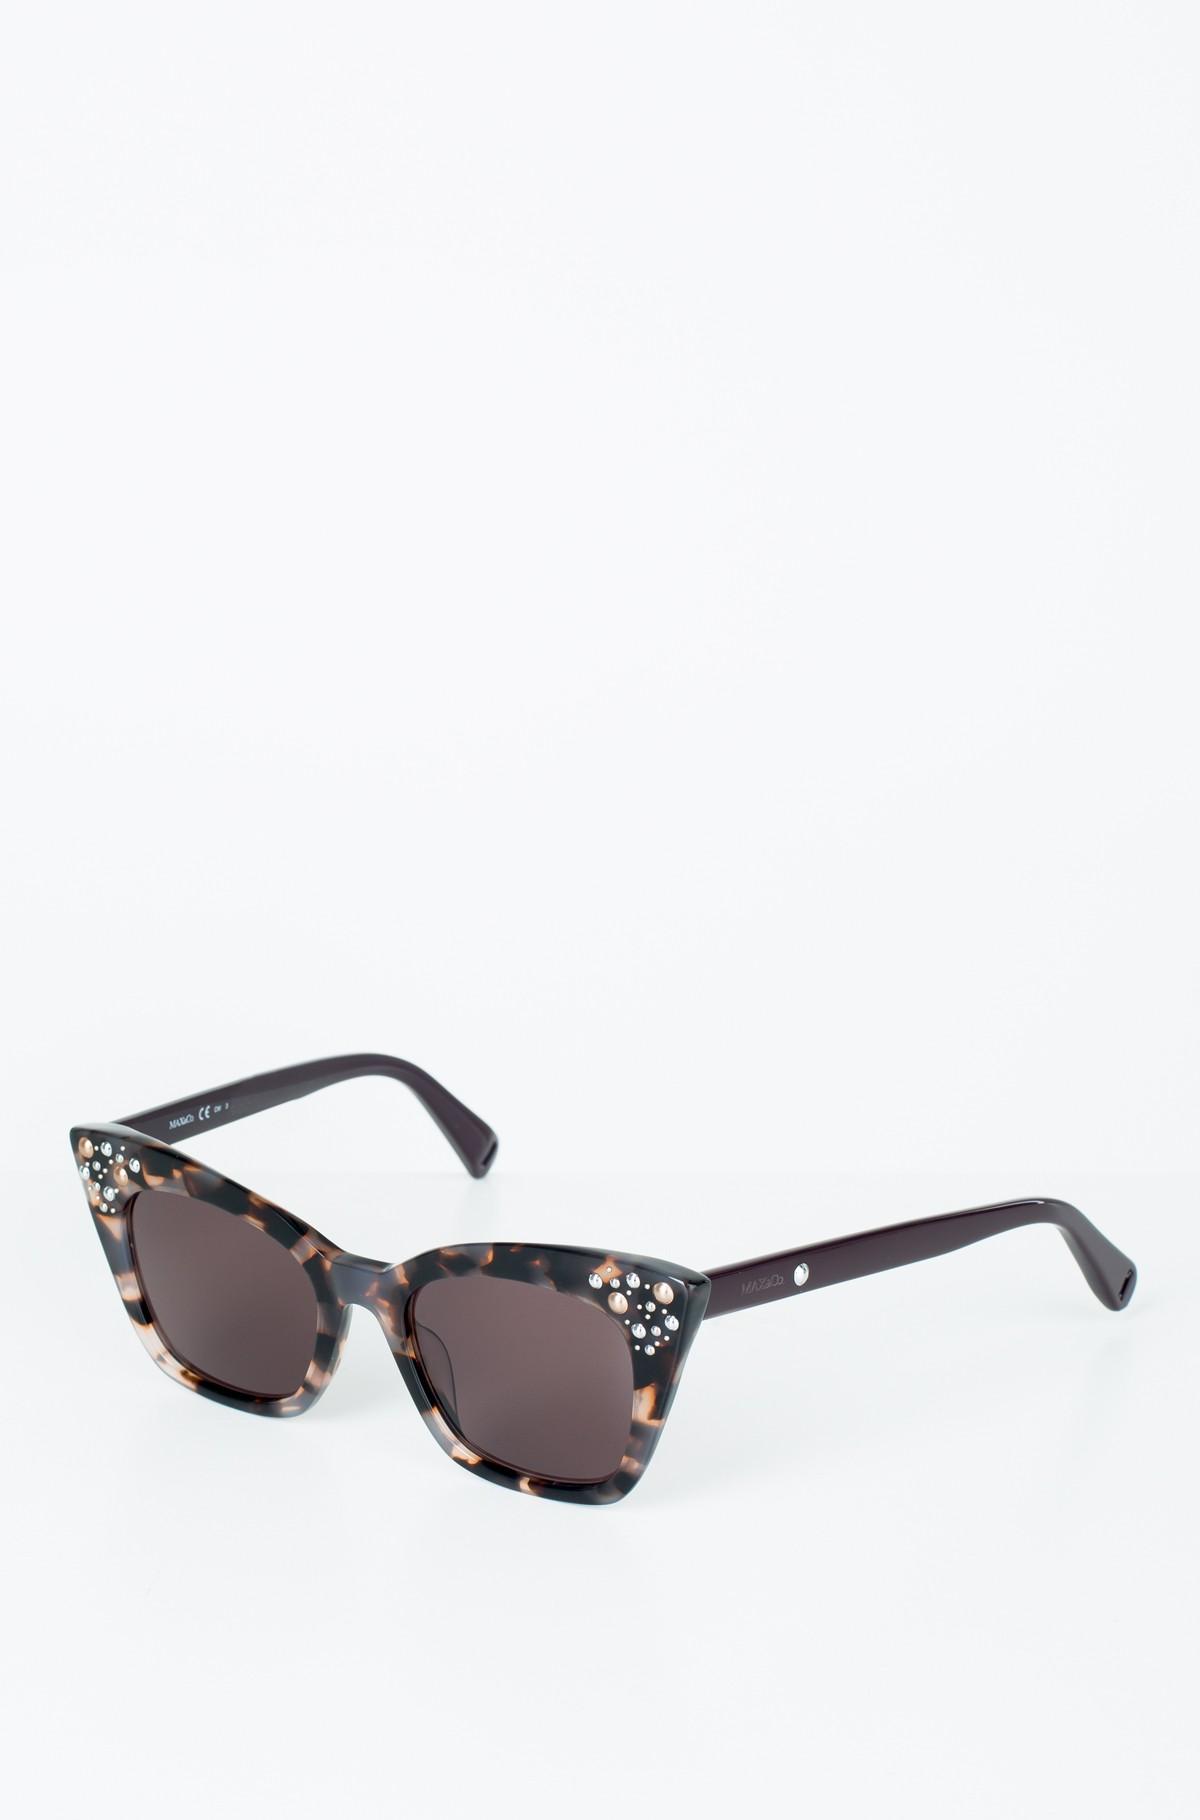 Sunglasses ONTANO-full-1